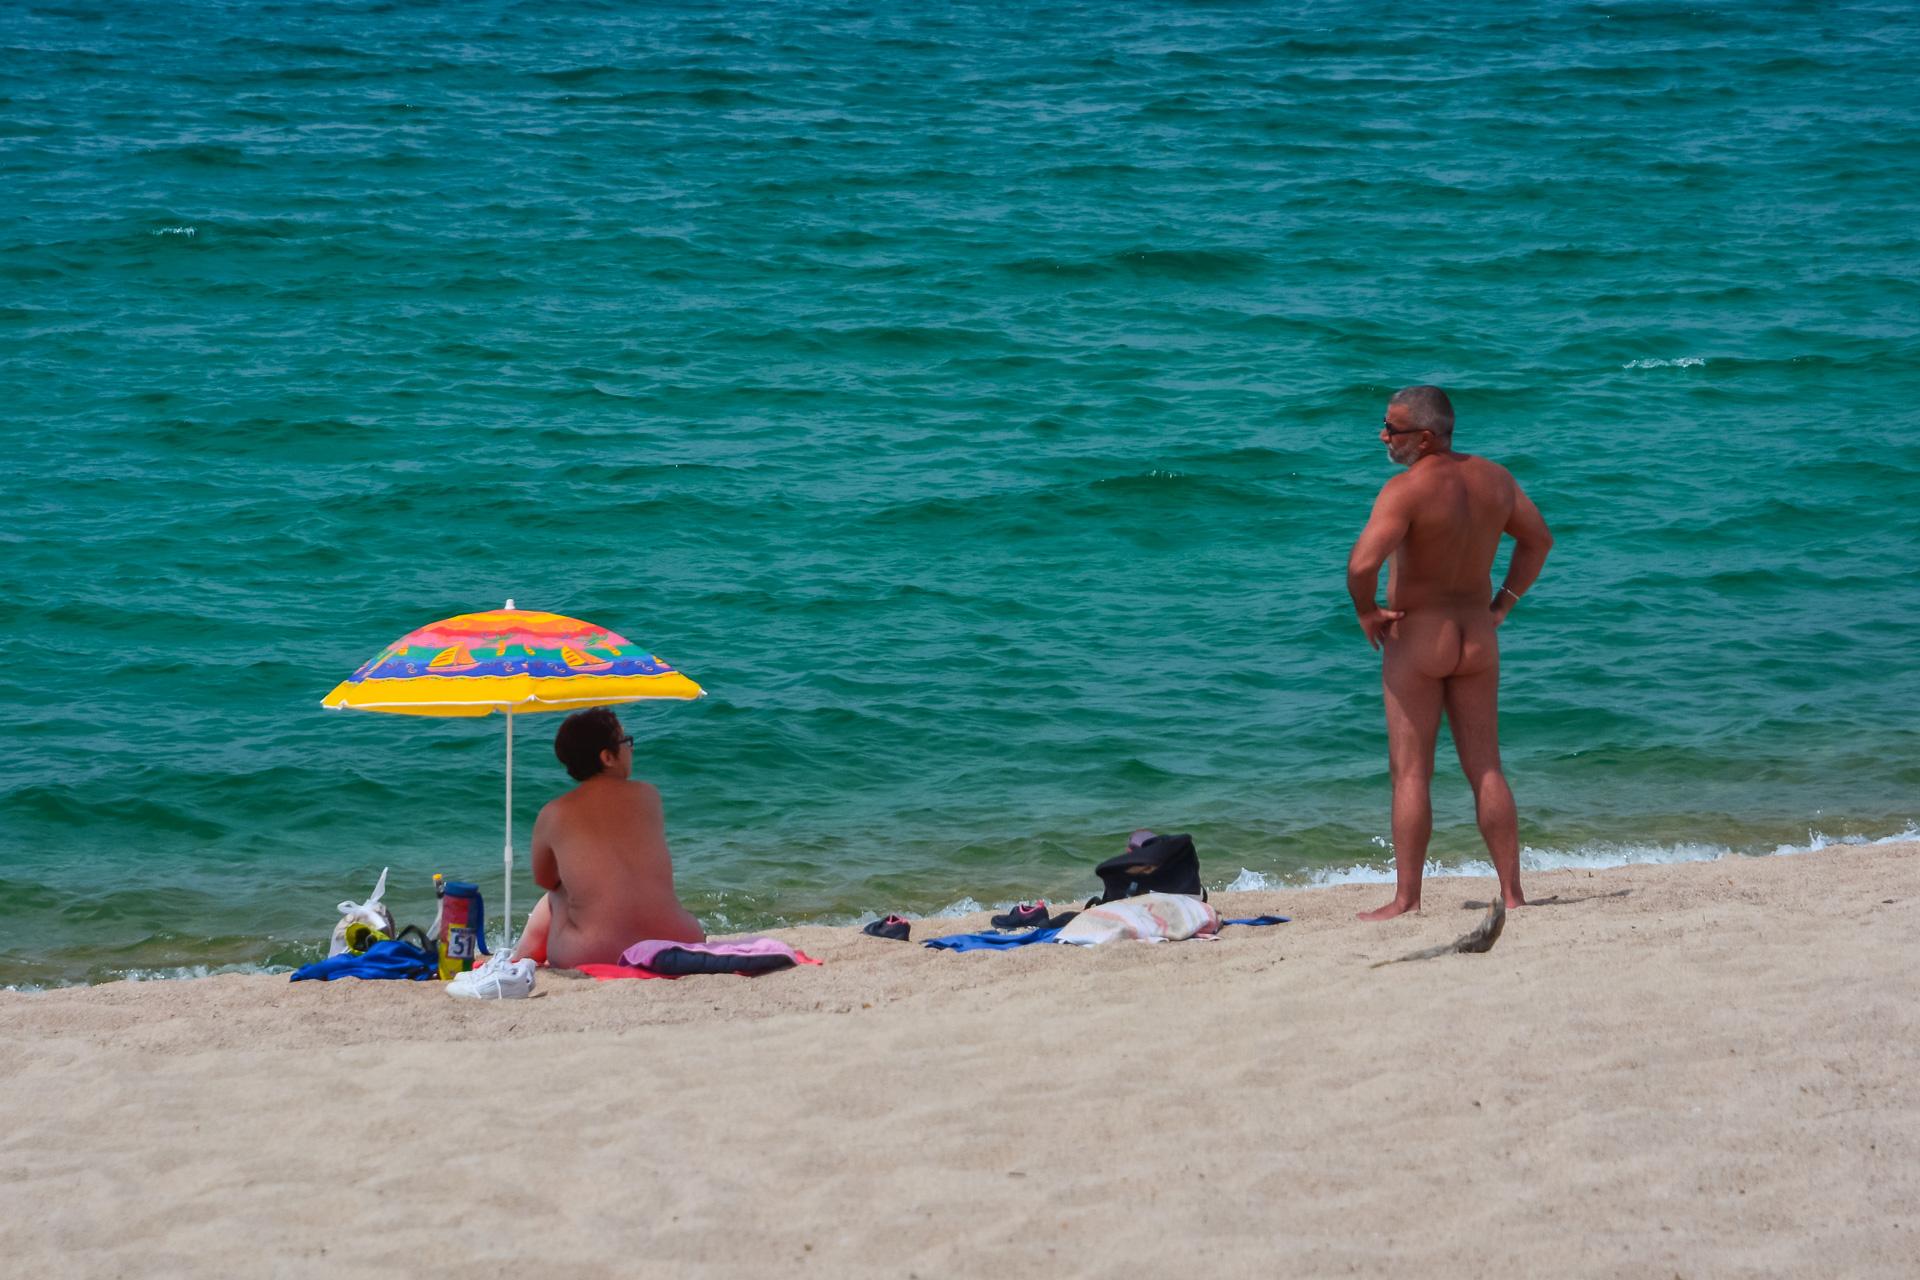 Bilder nackte nudisten Nackte Nudisten